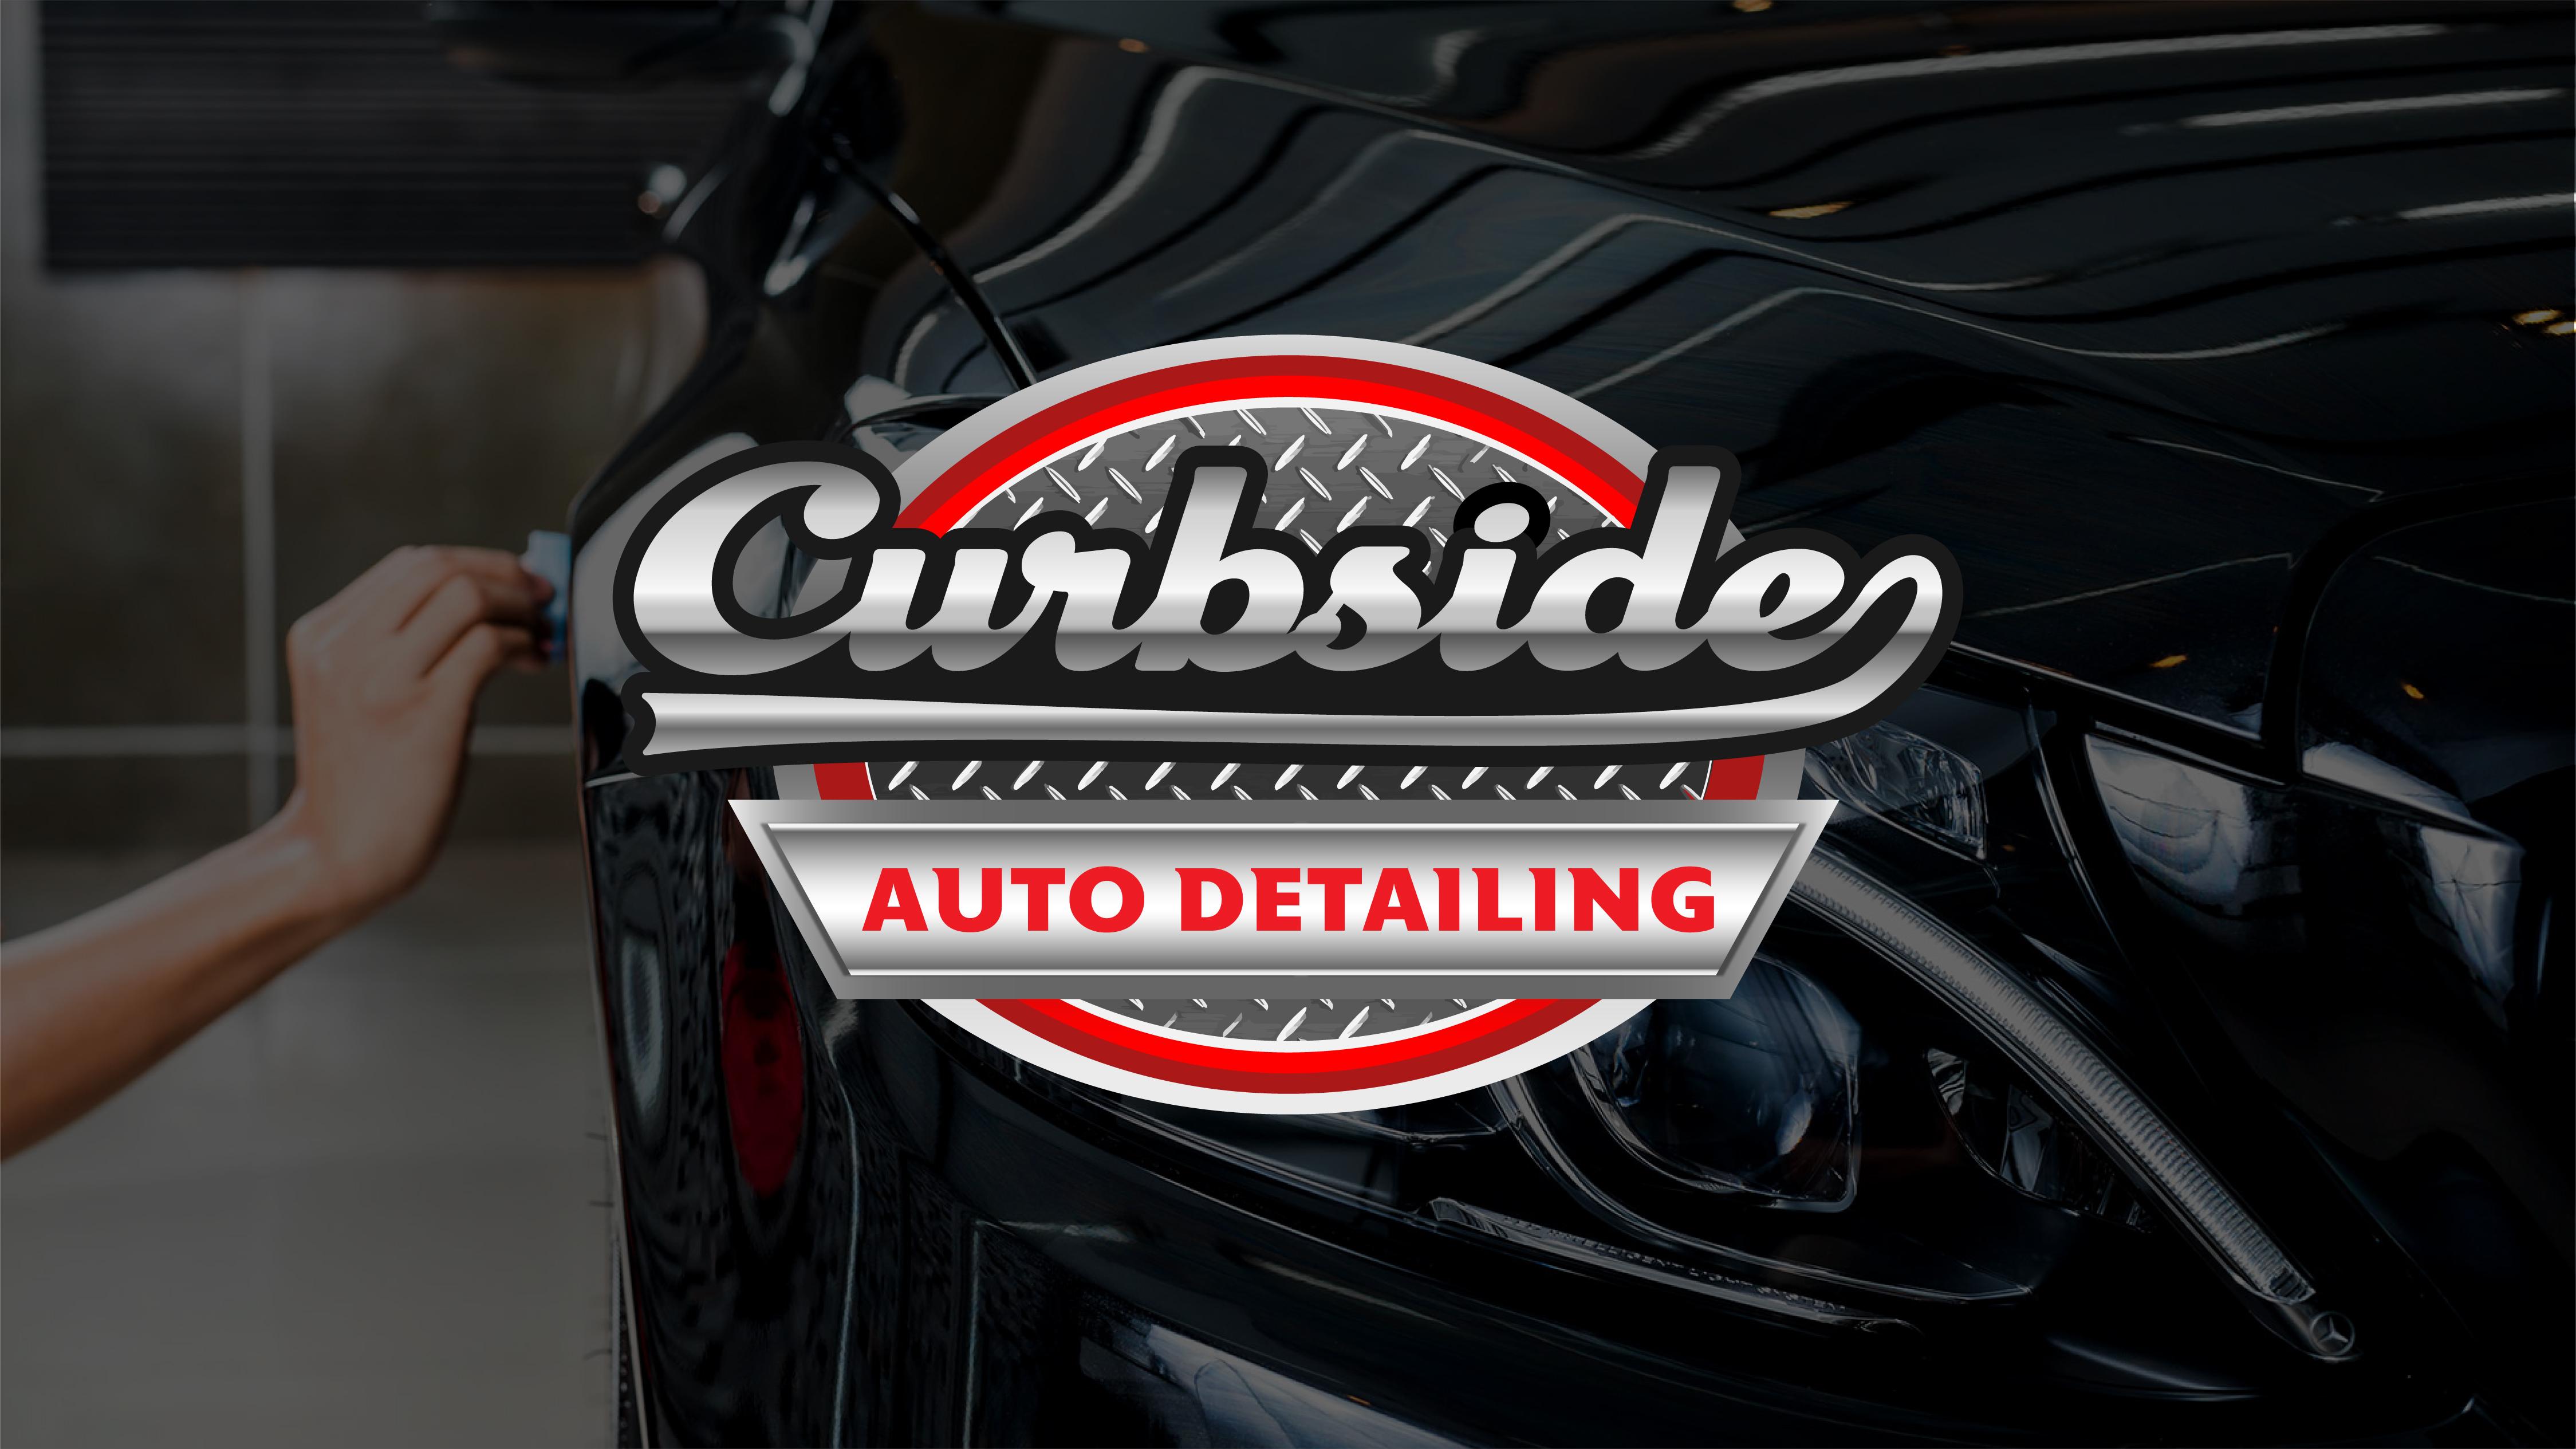 Curbside Auto Detailing logo.